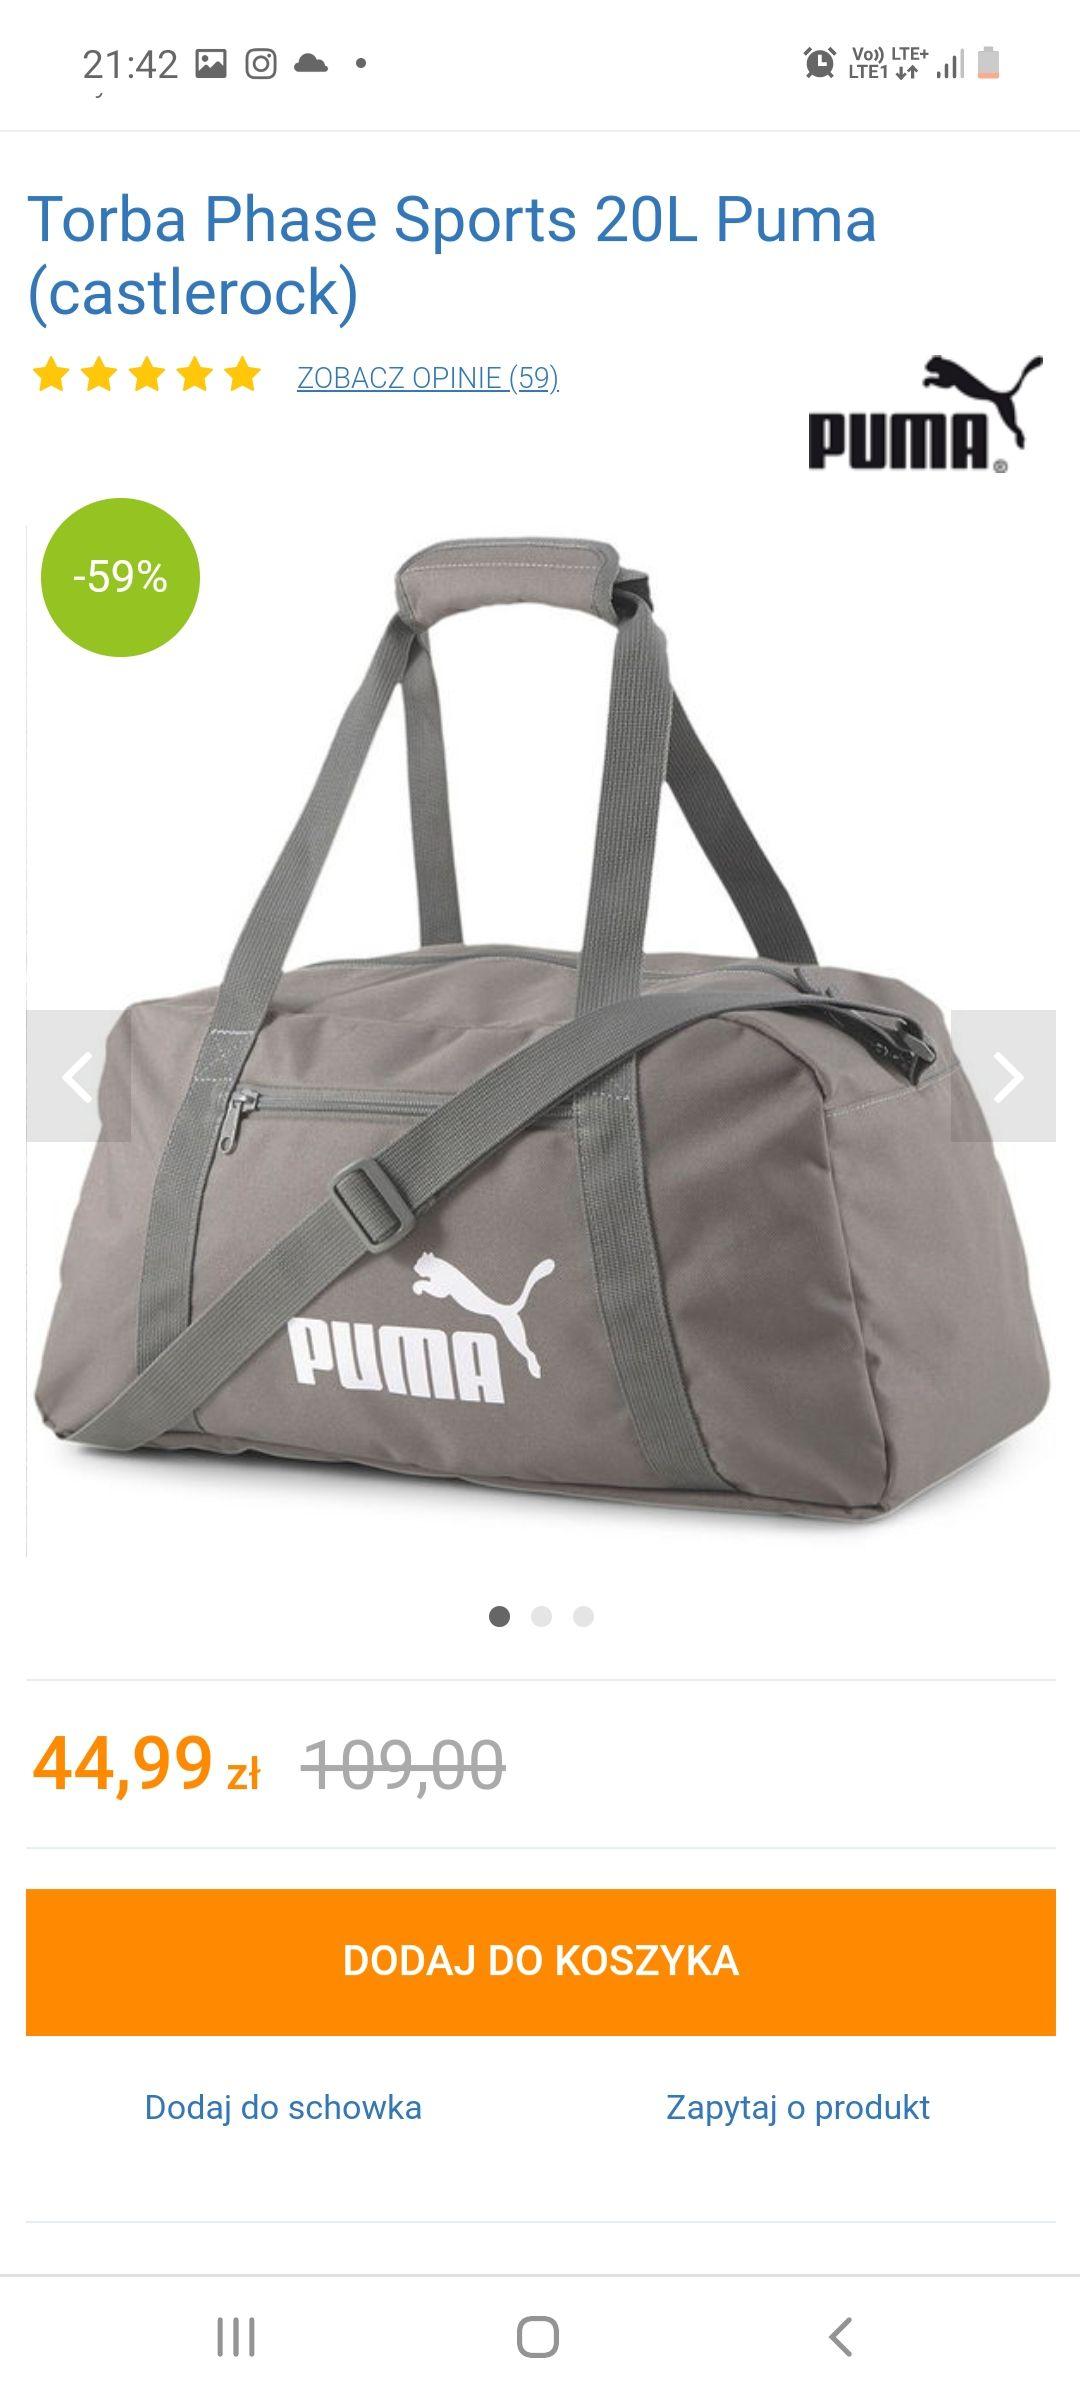 Torba Phase Sports 20L Puma (castlerock)